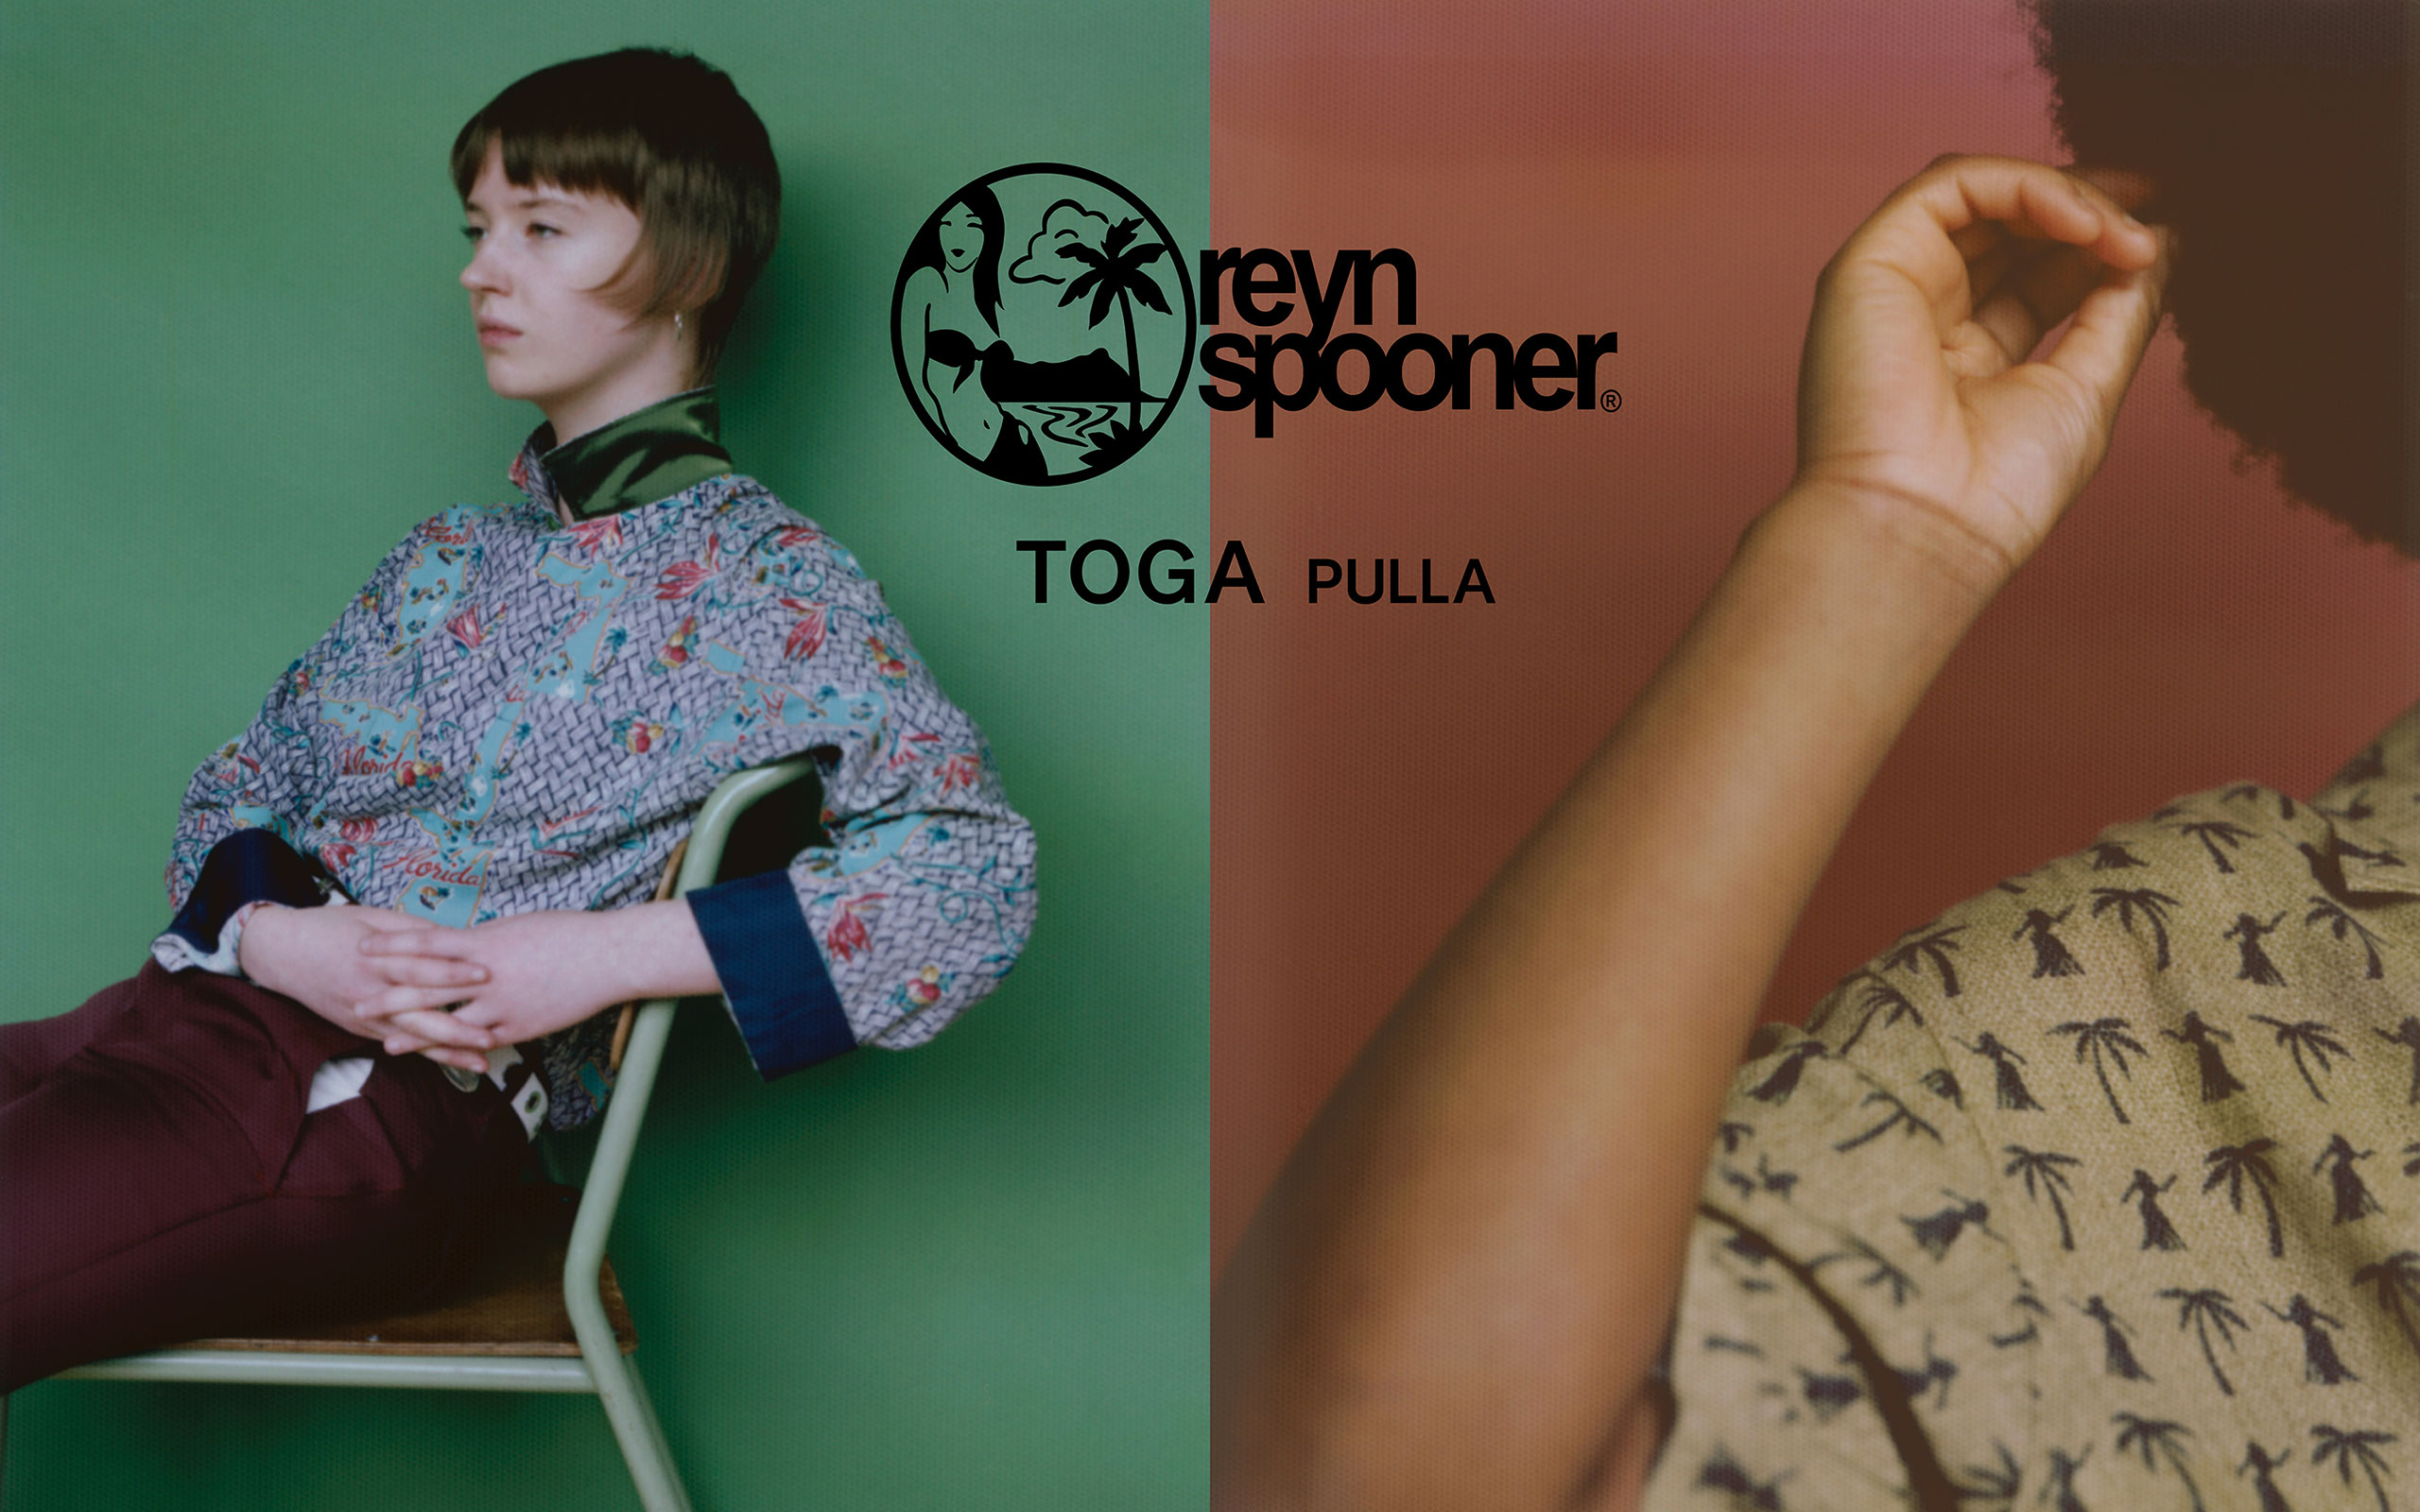 TOGA PULLA × reyn spooner Is Coming Back